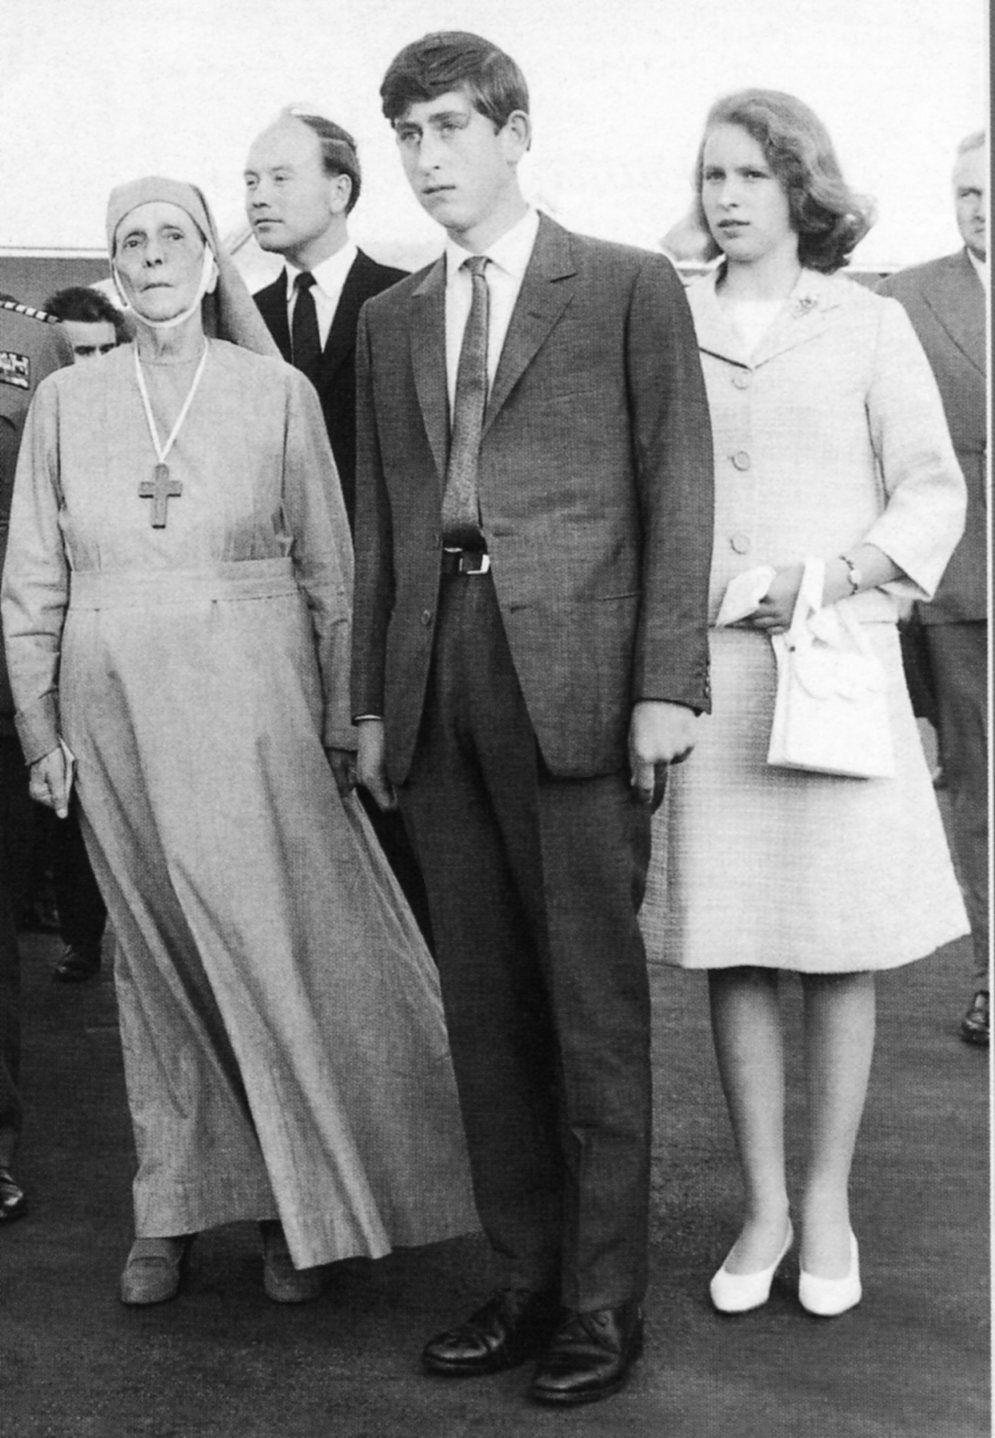 misshonoriaglossop via wgabry: Prince Charles and Princess Anne with their  Grandmother Princess Alice … | English royal family, Royal family england, Princess  alice